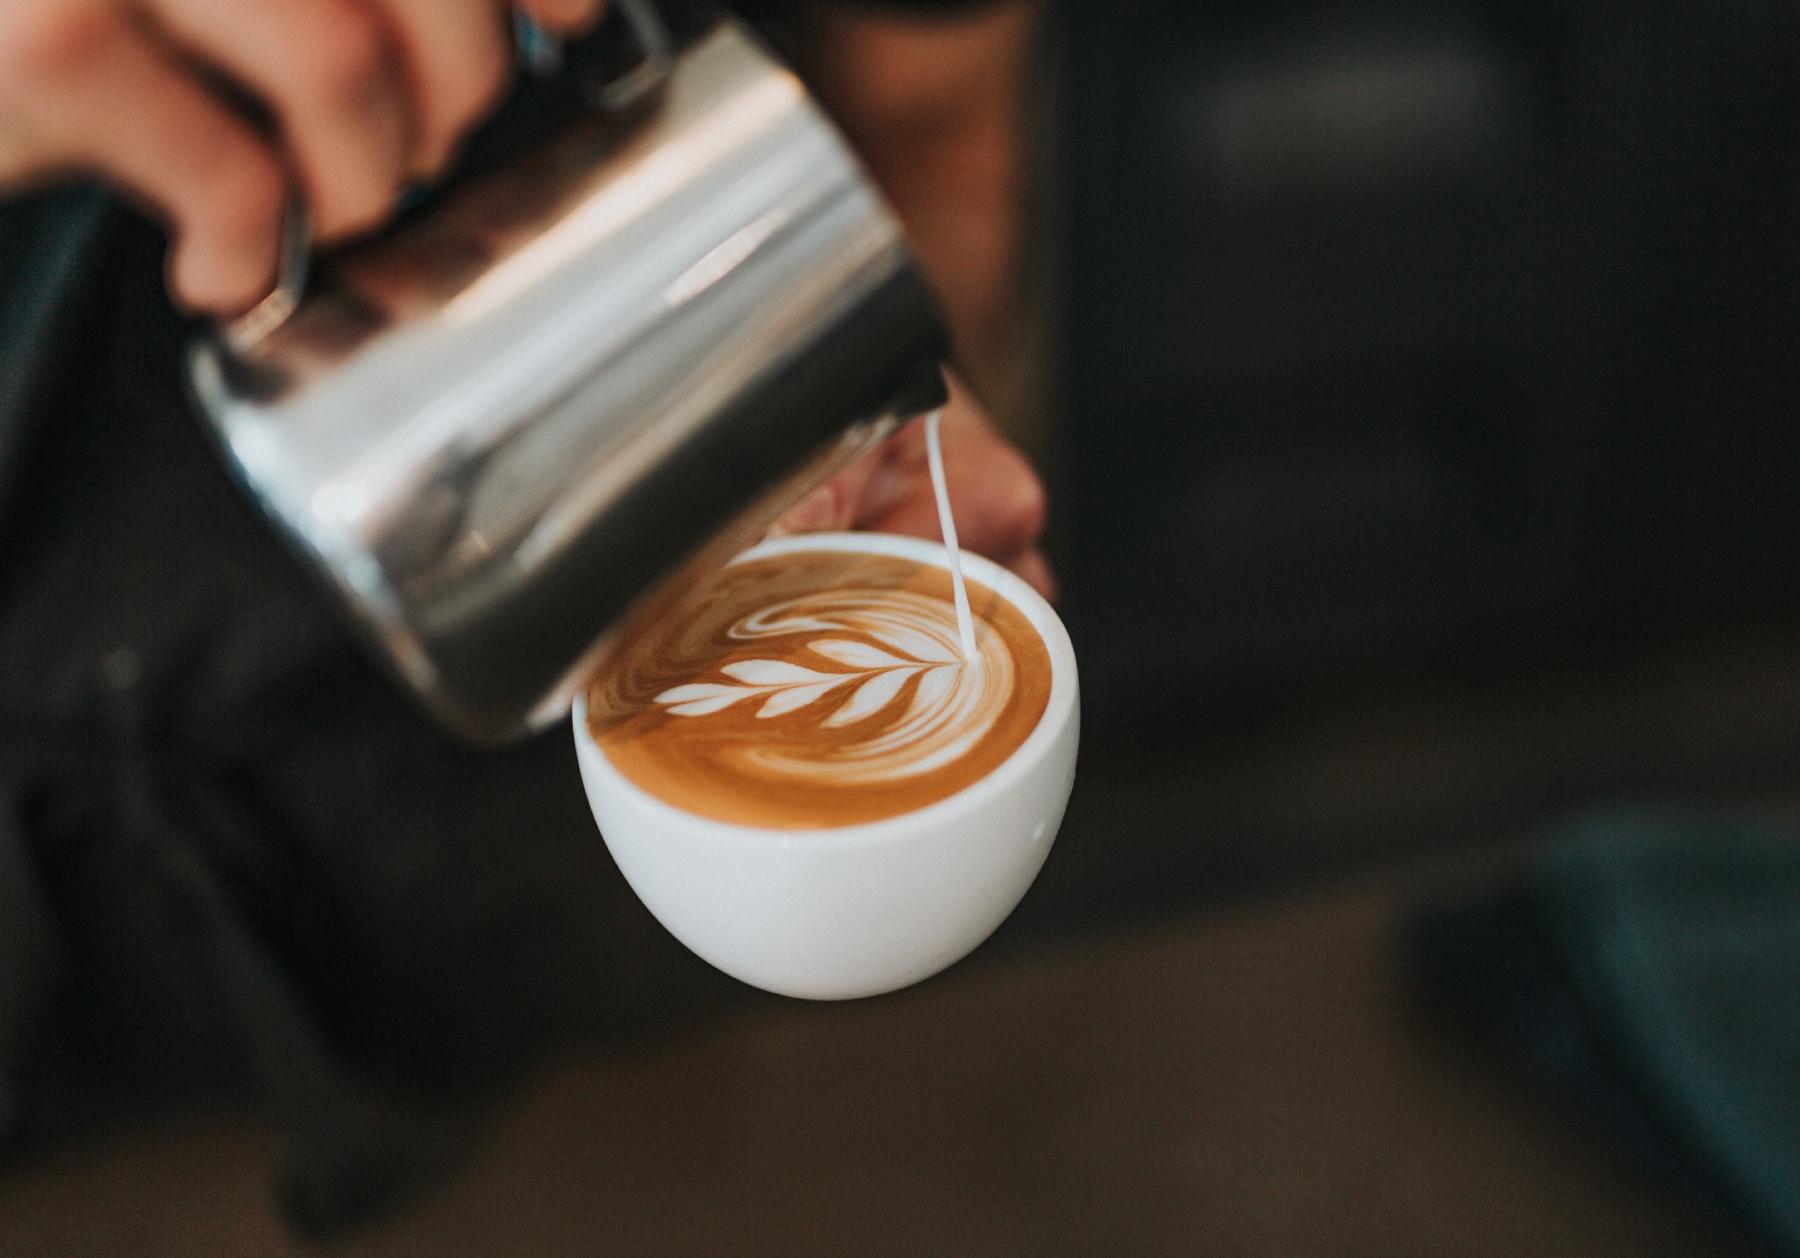 Anyone for coffee?